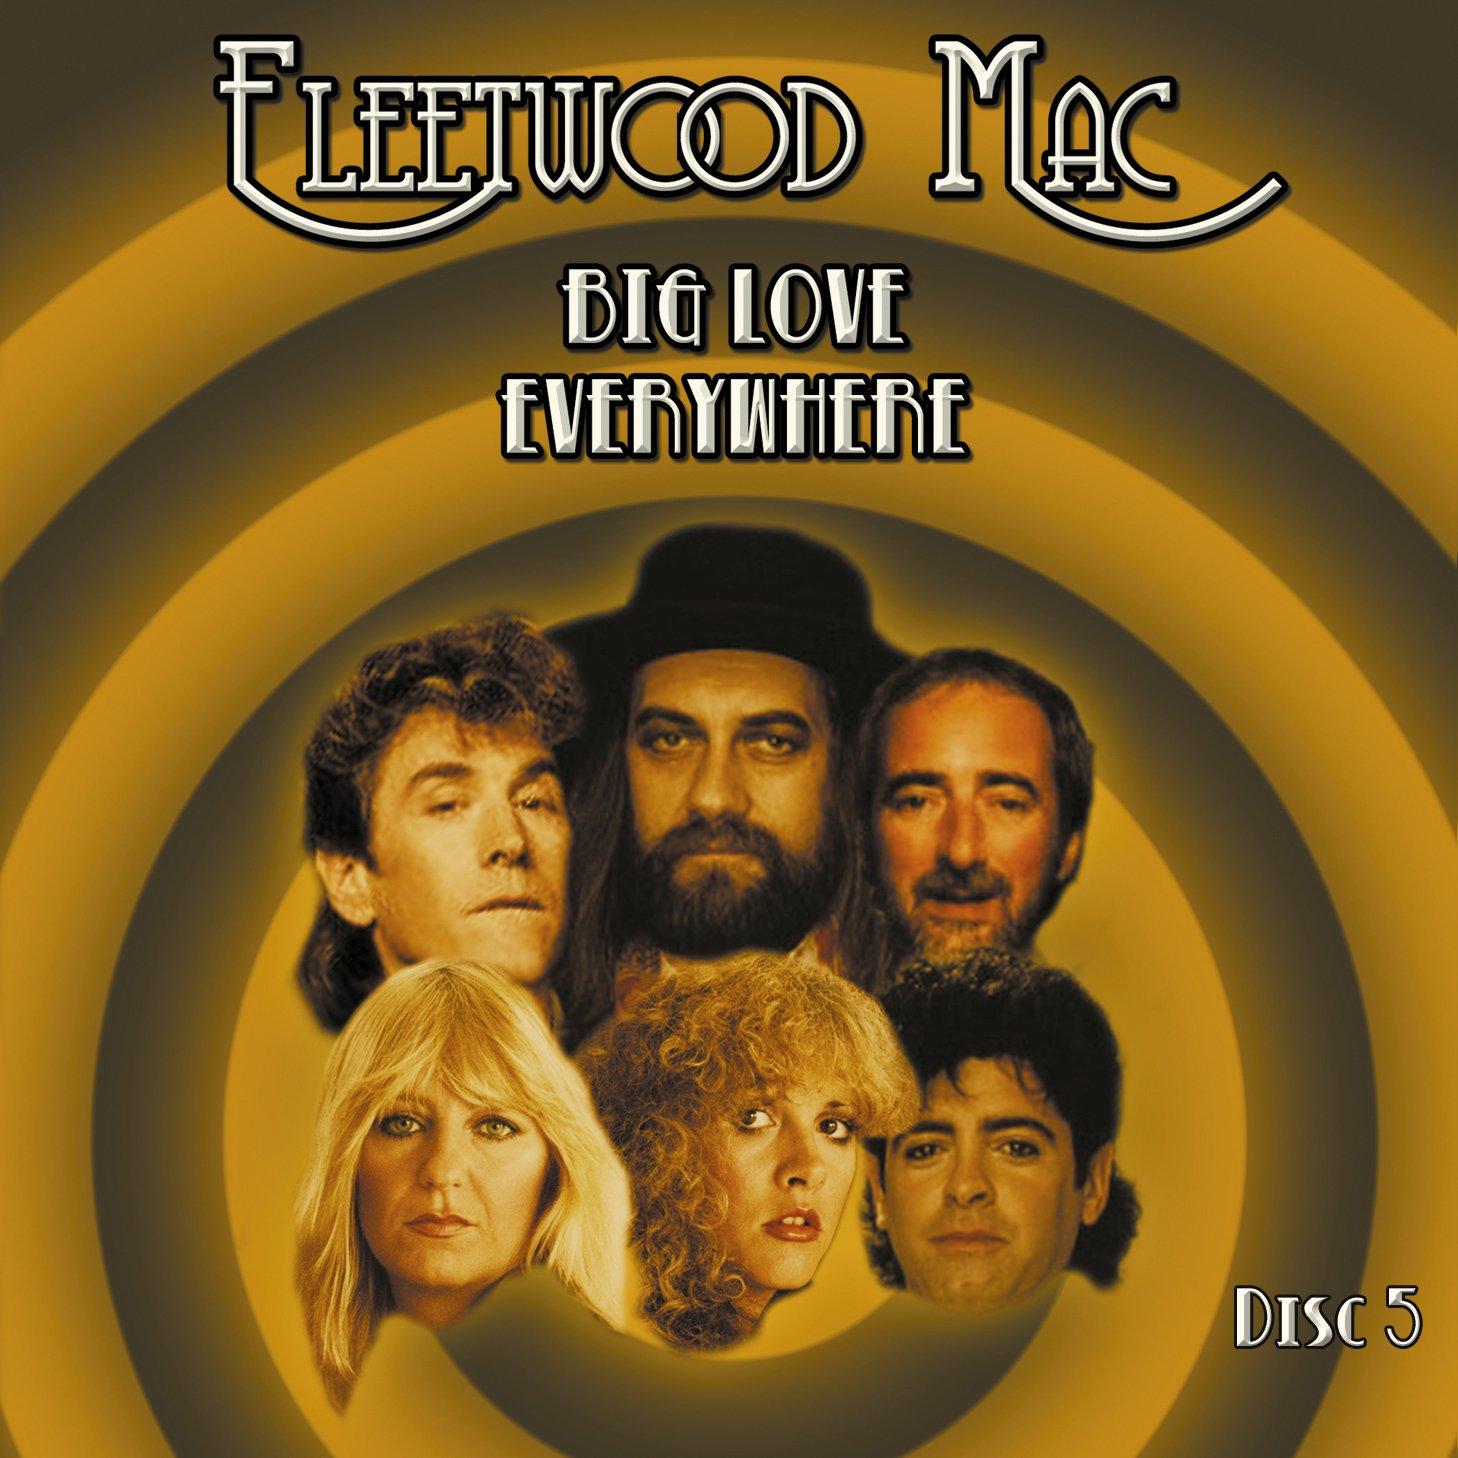 Fleetwood Mac Gold Dust Woman Lyrics And Chords